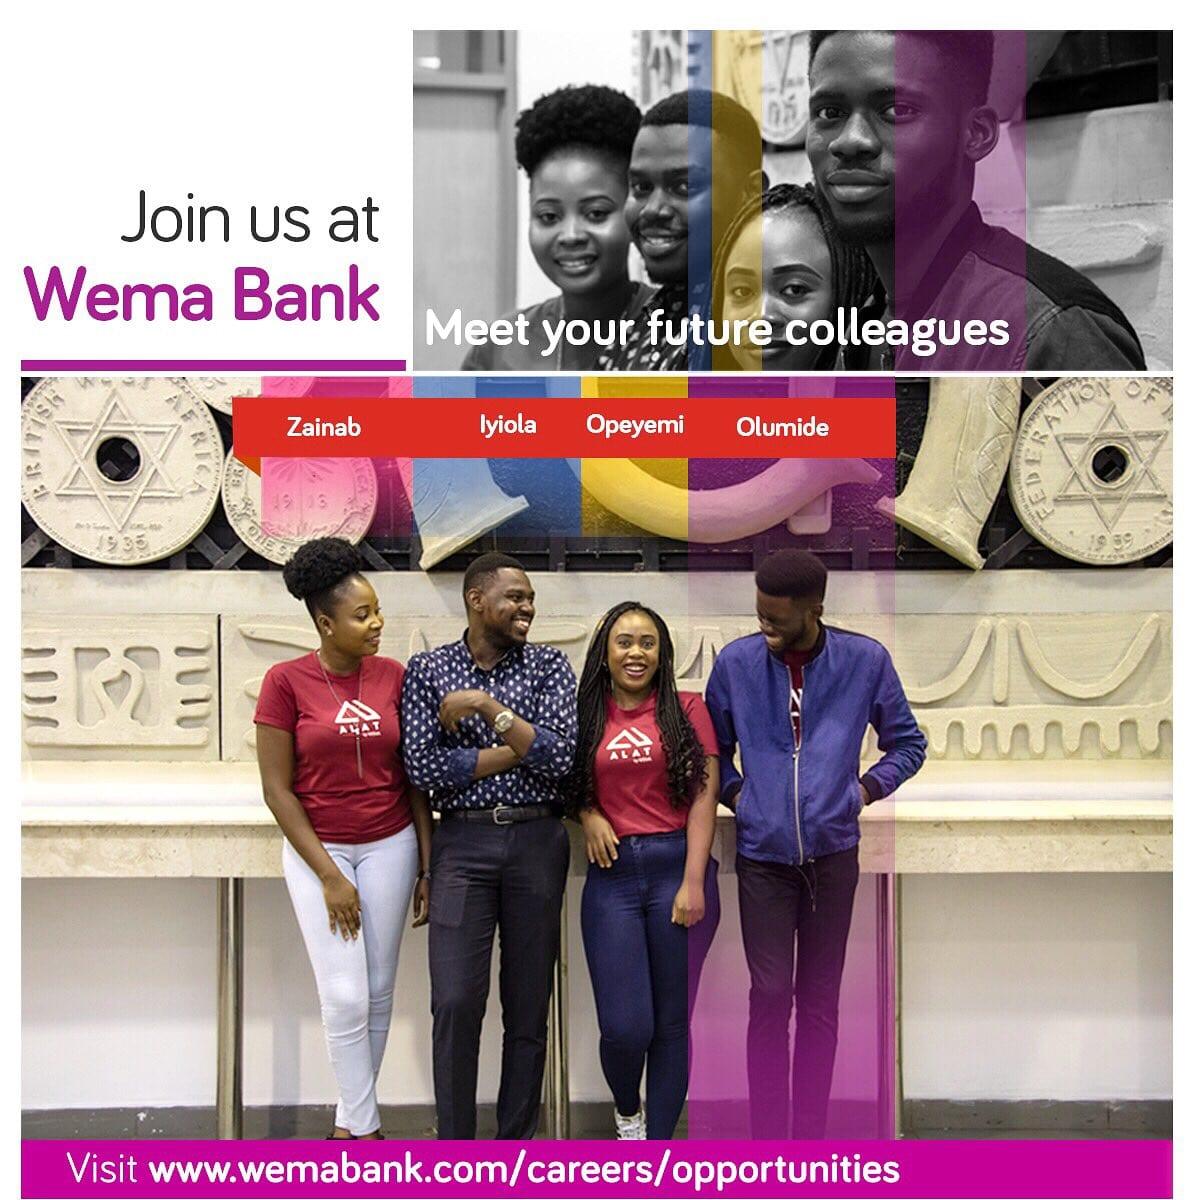 Wema Bank Graduate Trainee Recruitment 2018 for young Nigerian graduates.